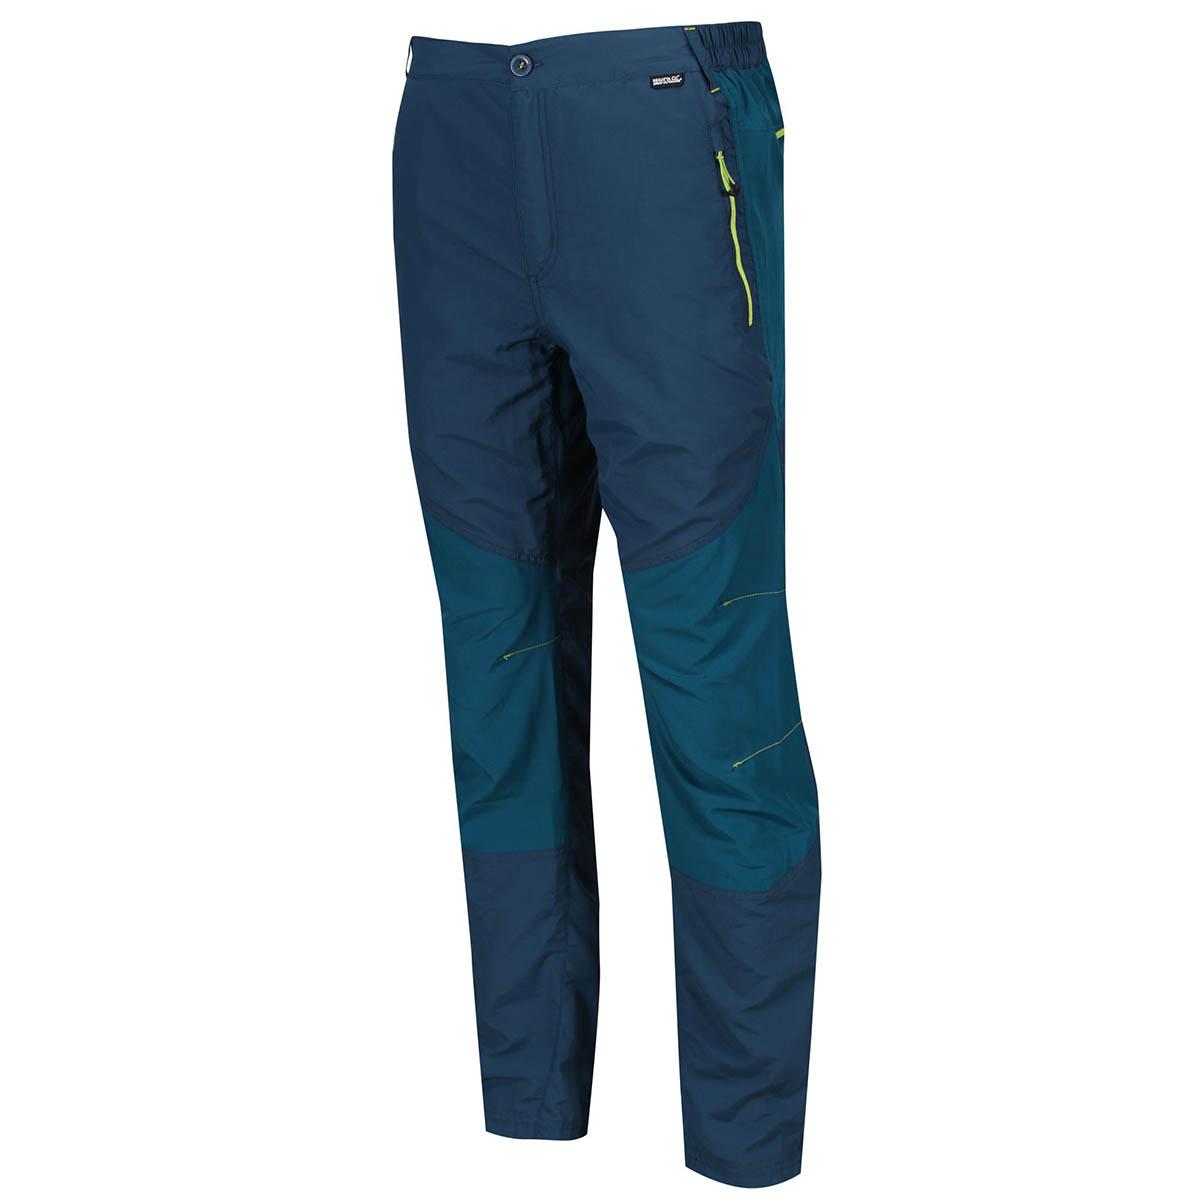 Regatta-Mens-Sungari-Lightweight-Water-Repellent-Stretch-Trousers-70-OFF-RRP thumbnail 4